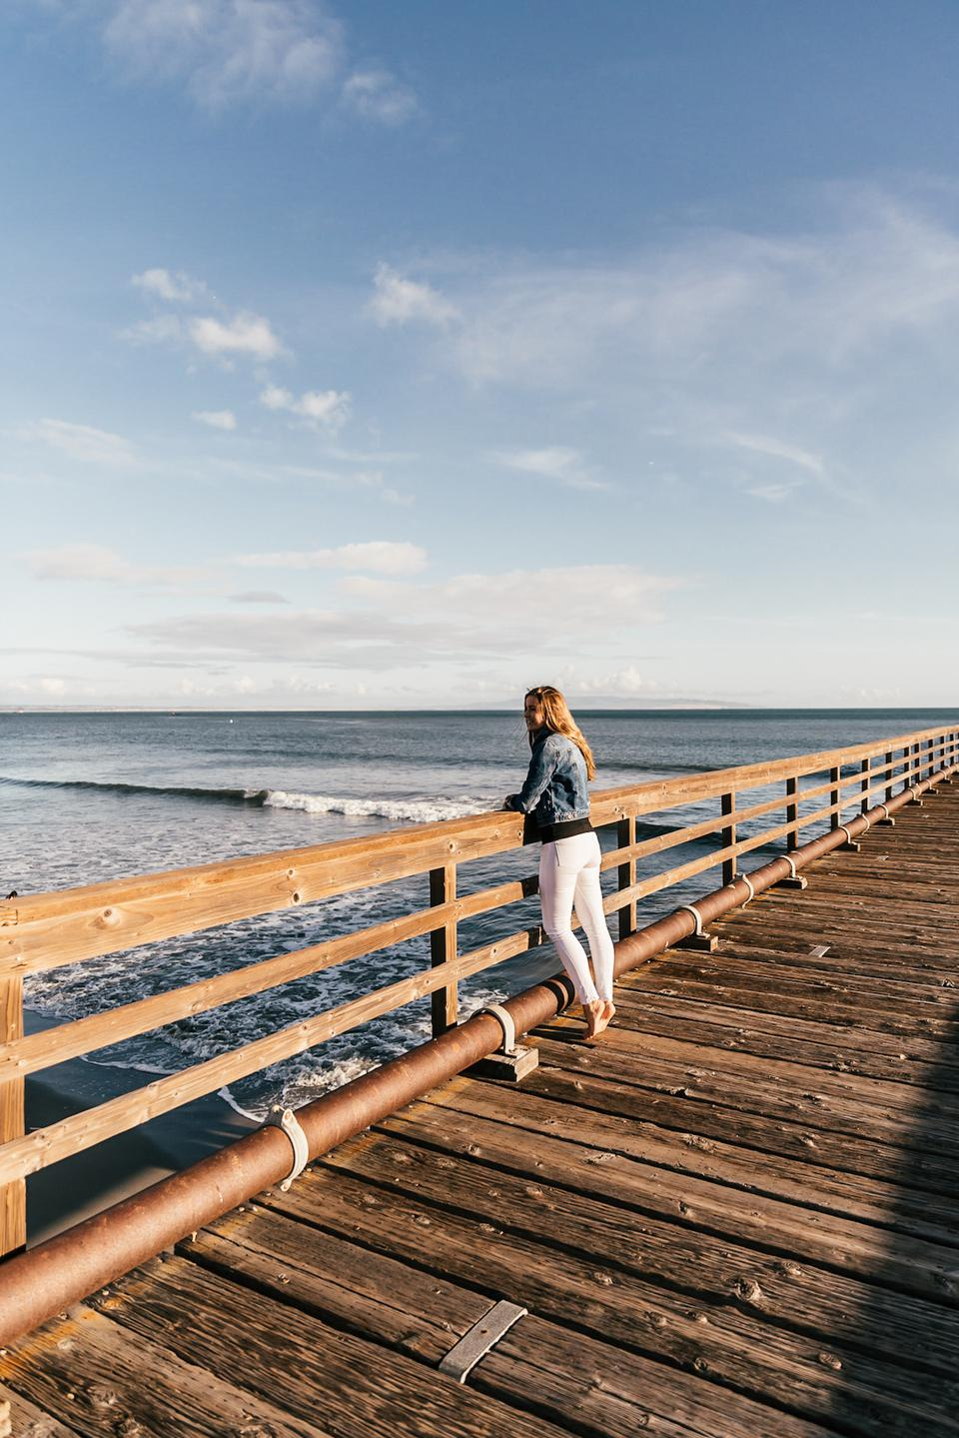 Newport beach, domestic travel, where to travel in 2021, top destination